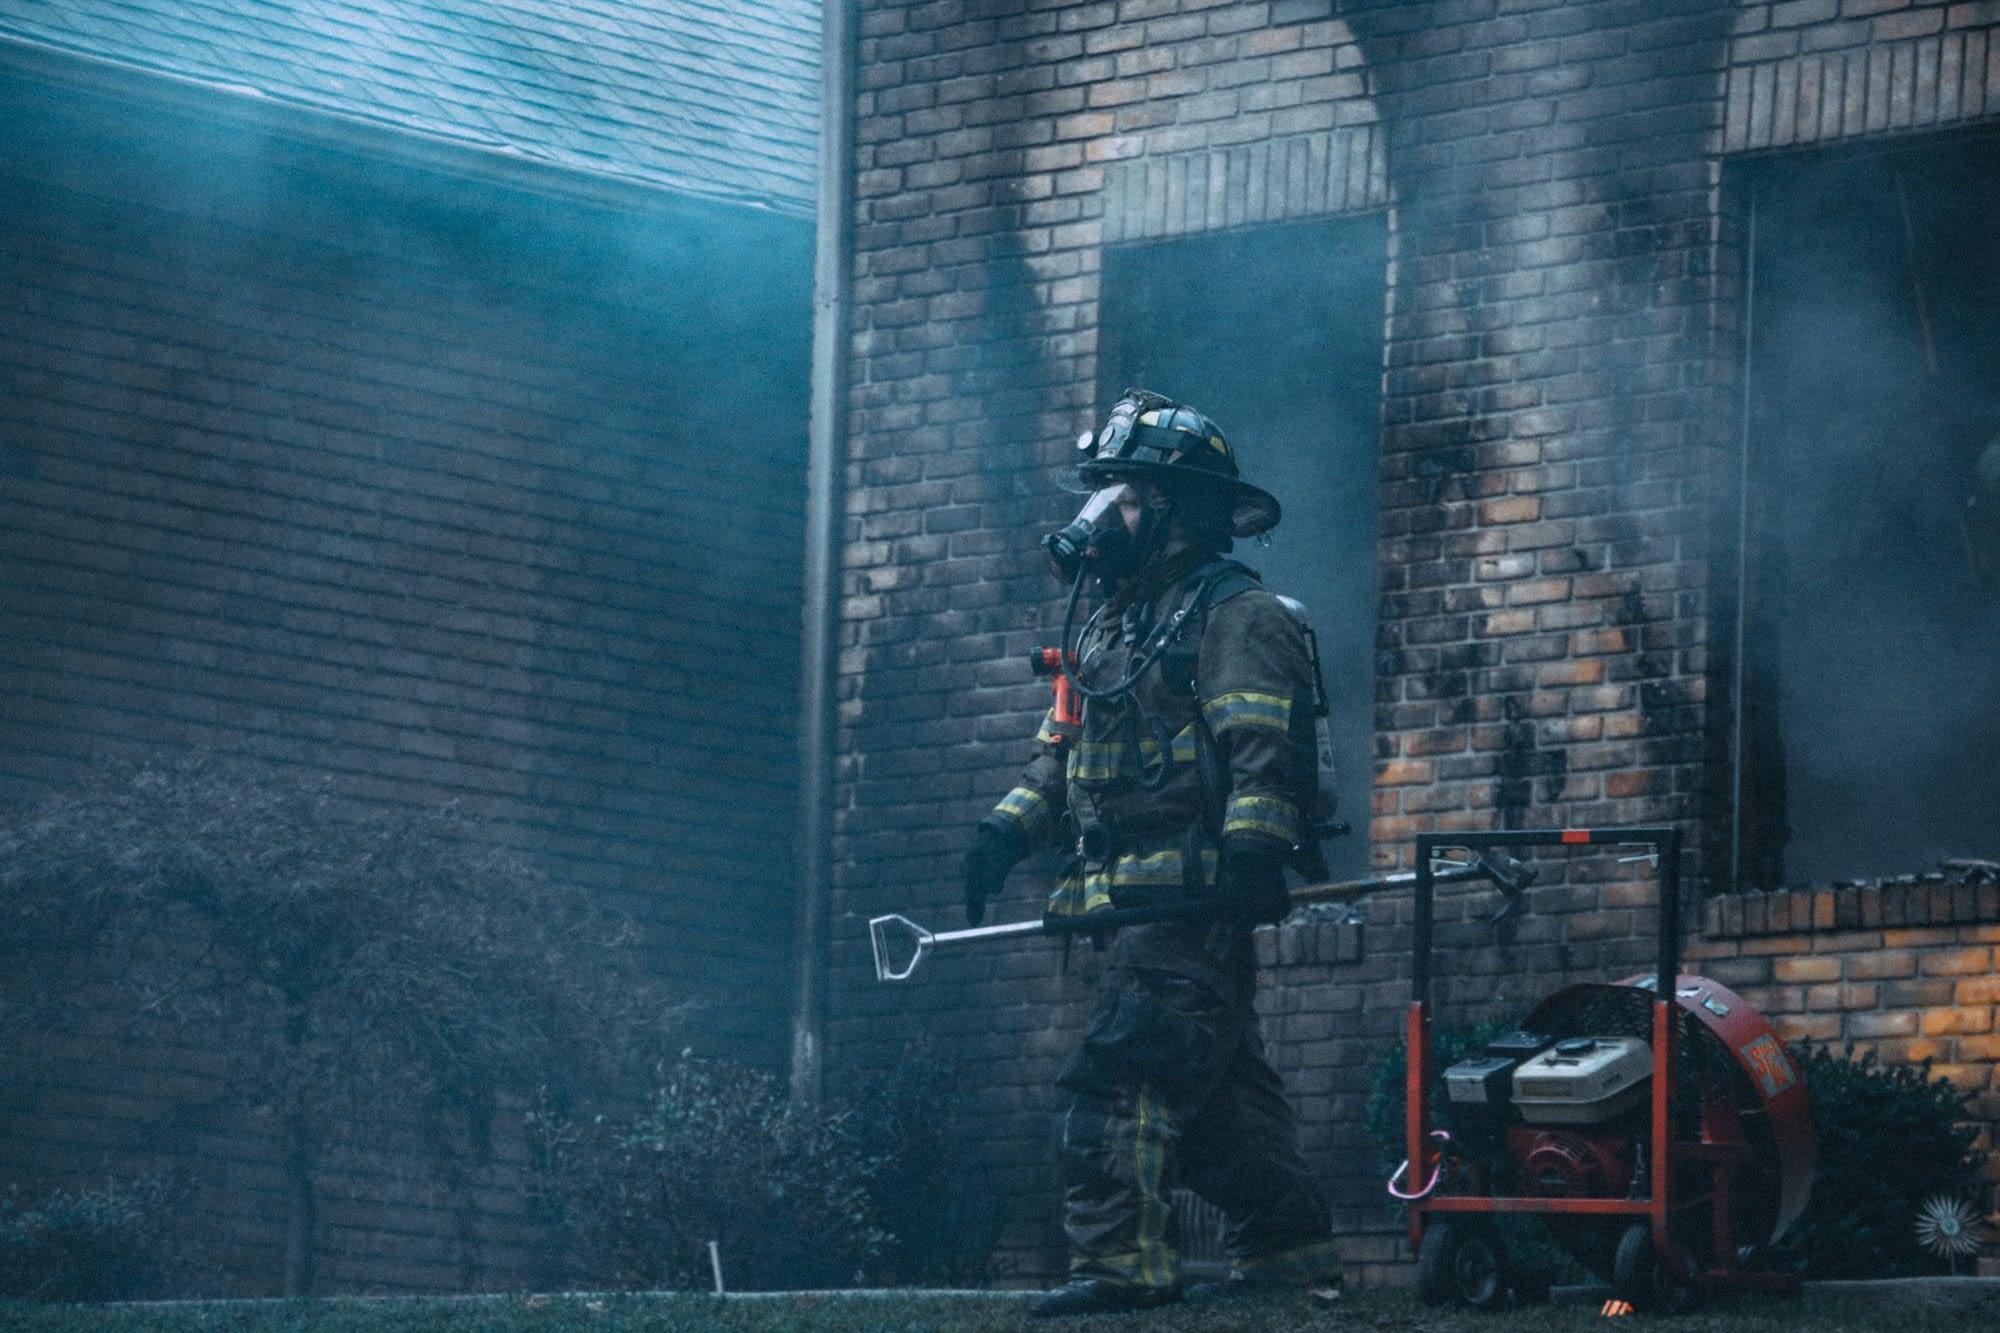 Brandweerman in acite